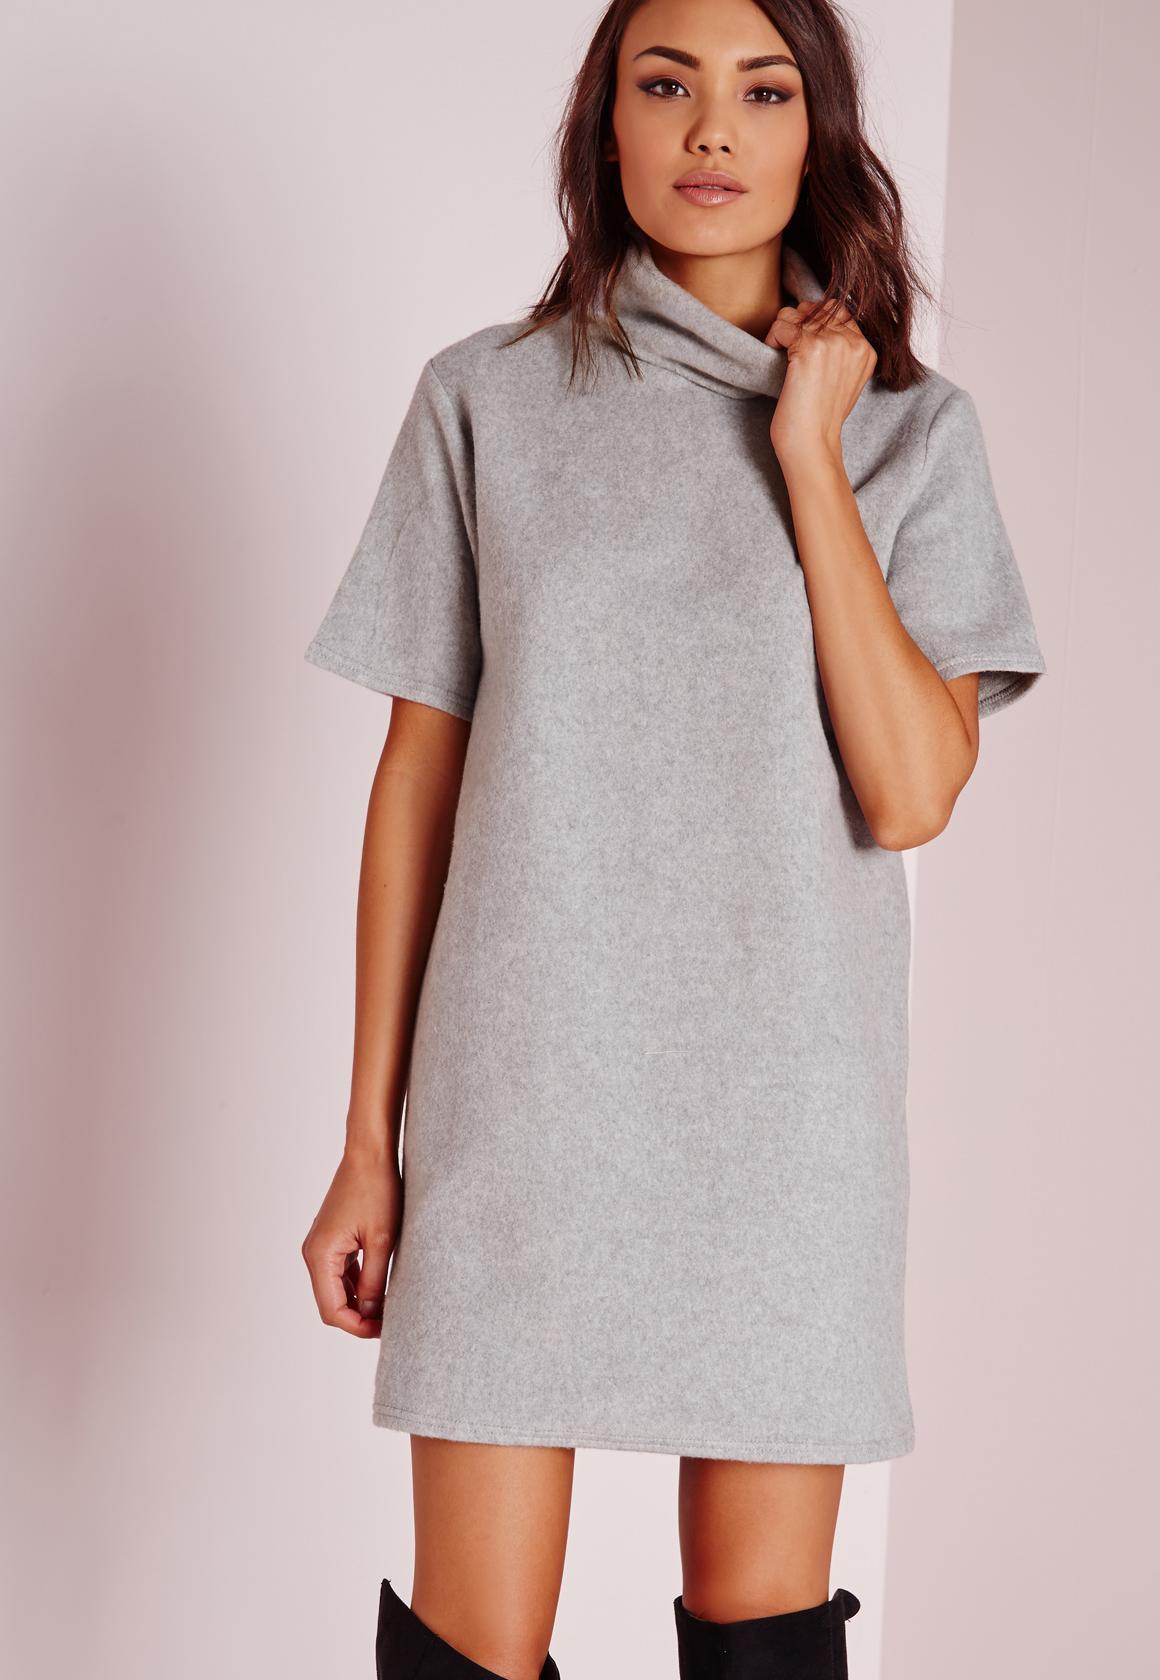 ... Roll Neck Short Sleeve Fleecy Jumper Dress Grey. Previous Next 74be4db6f